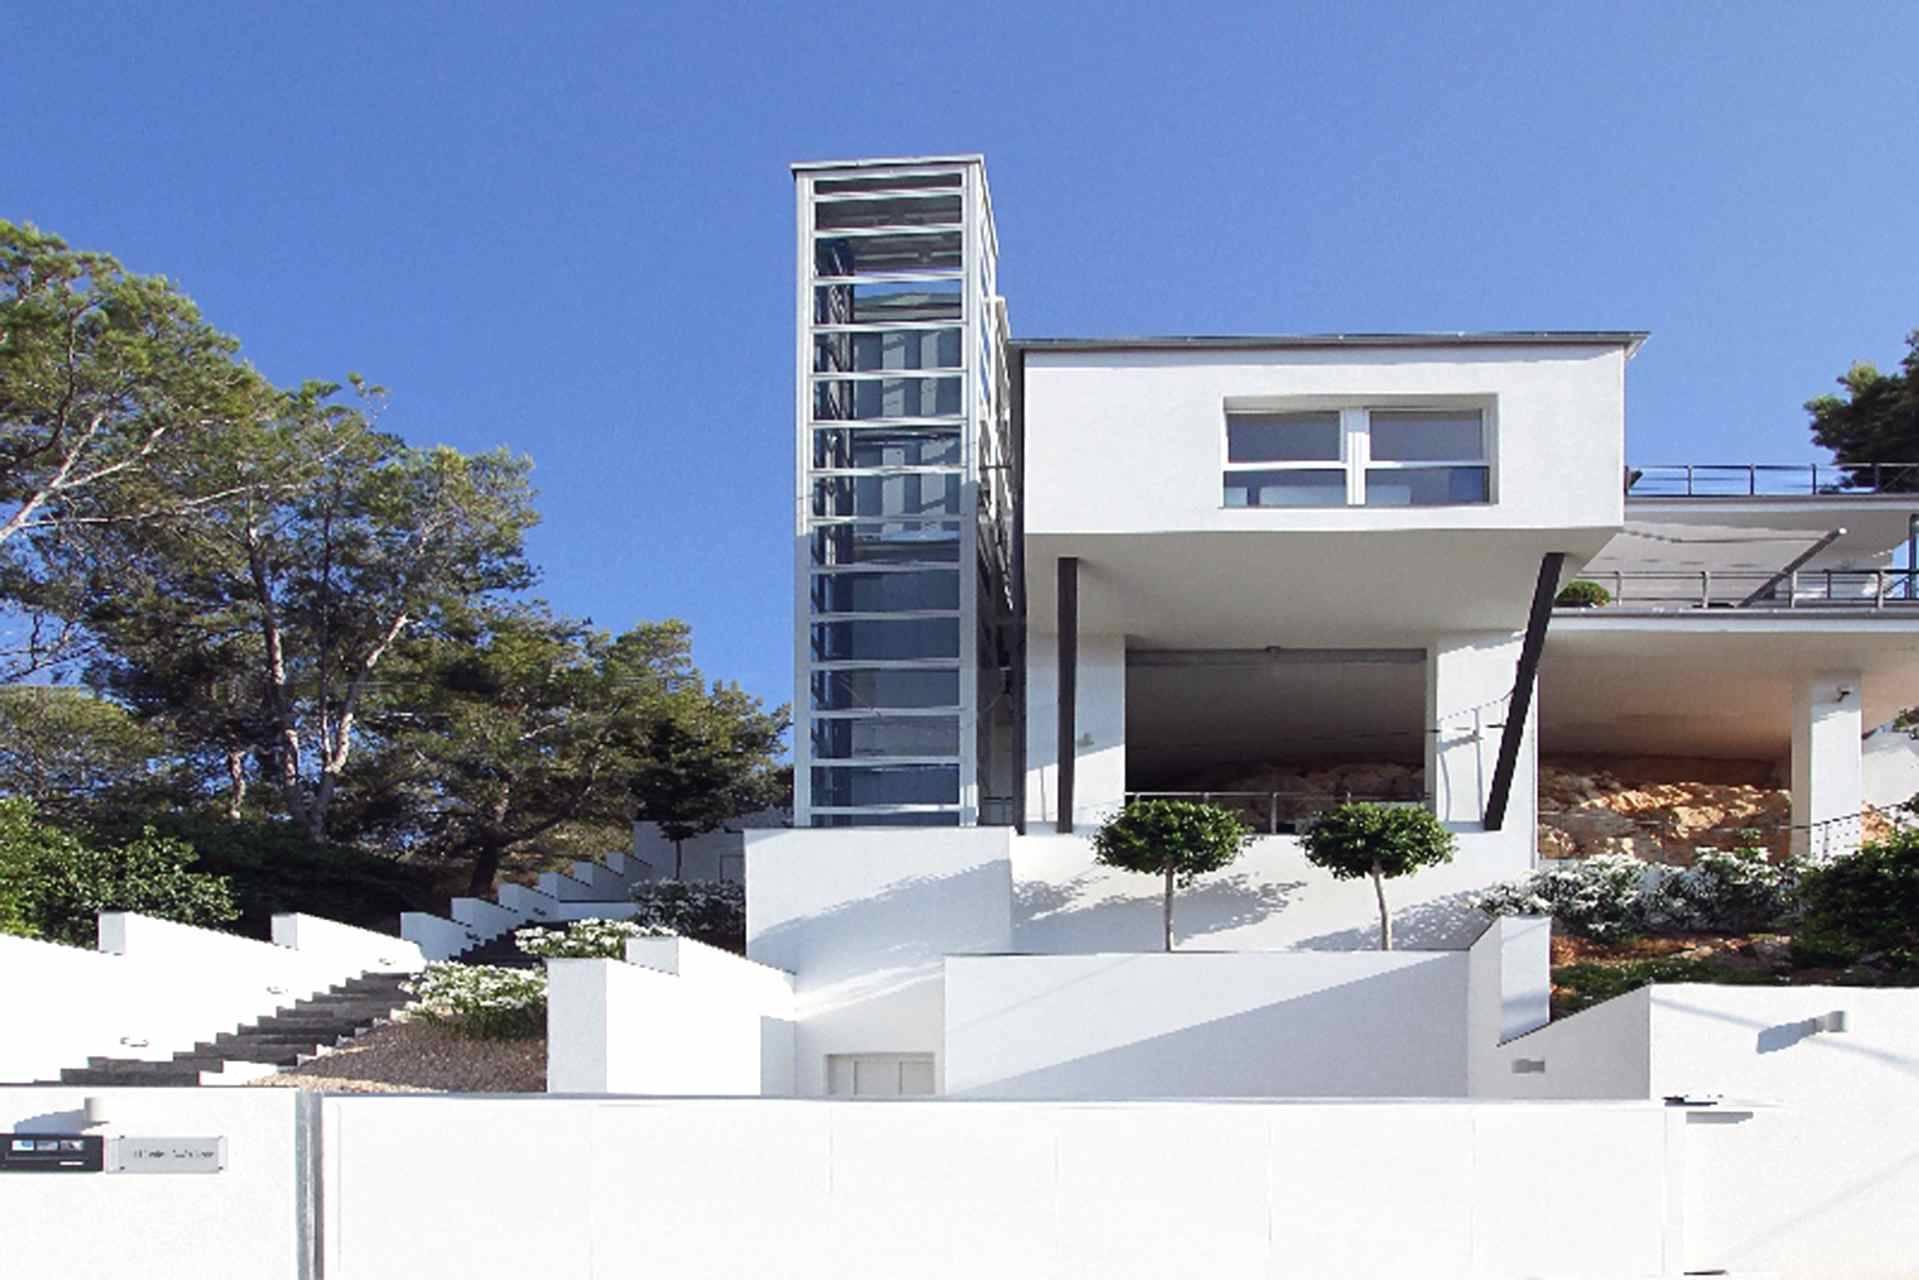 01-04 Bauhaus Villa Mallorca Südwesten Bild 1